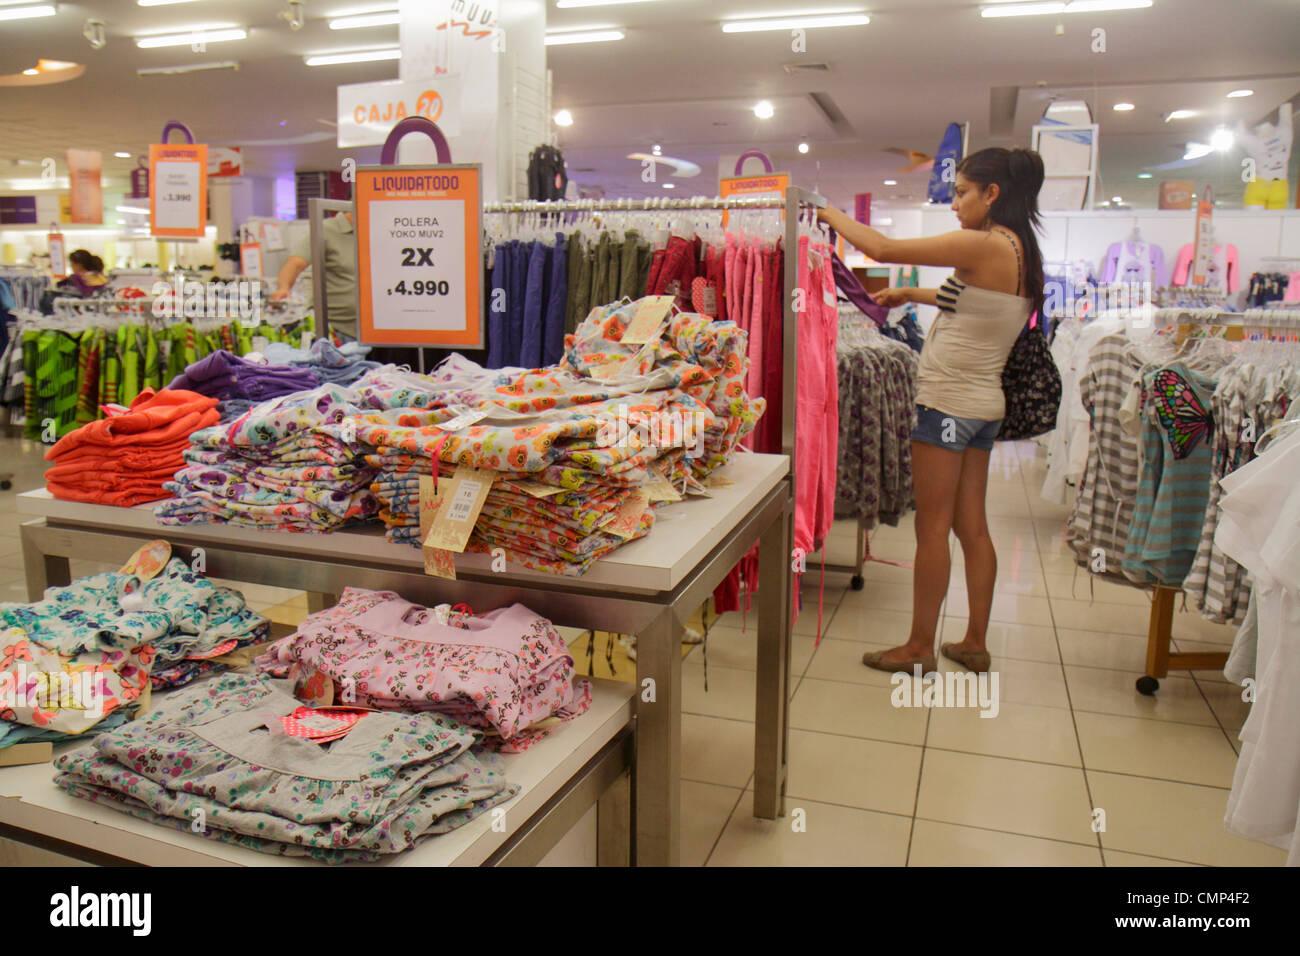 82849c5ba Chile Arica Paseo Peatonal 21 de Mayo Liquidatodo shopping outlet store  clothing clothes women's apparel fashion retail display